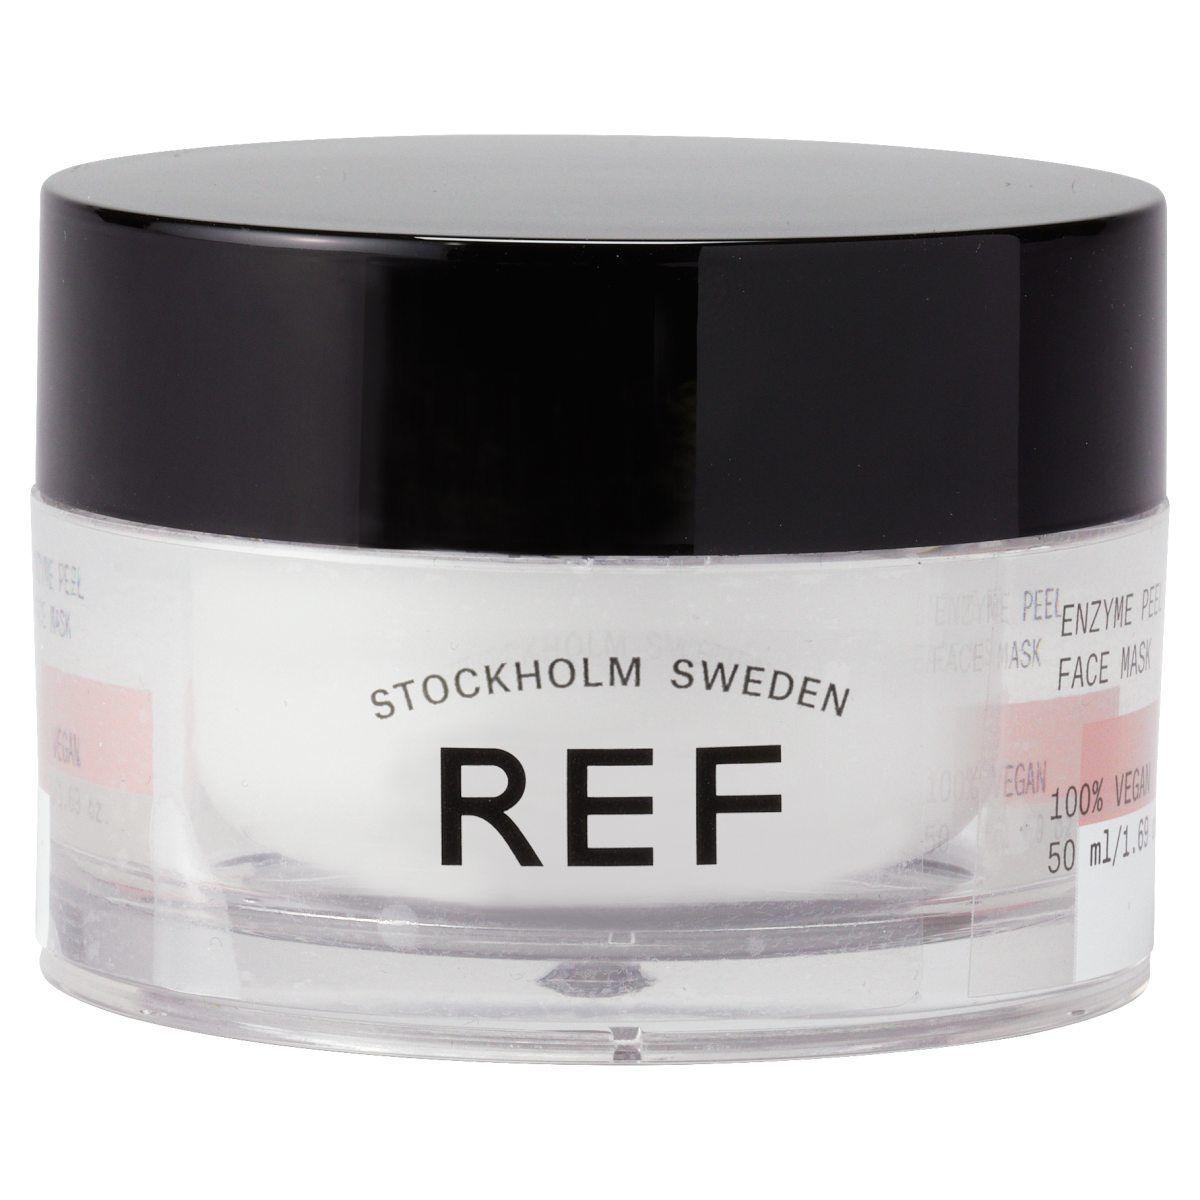 REF Enzyme Peel Face Mask 50ml